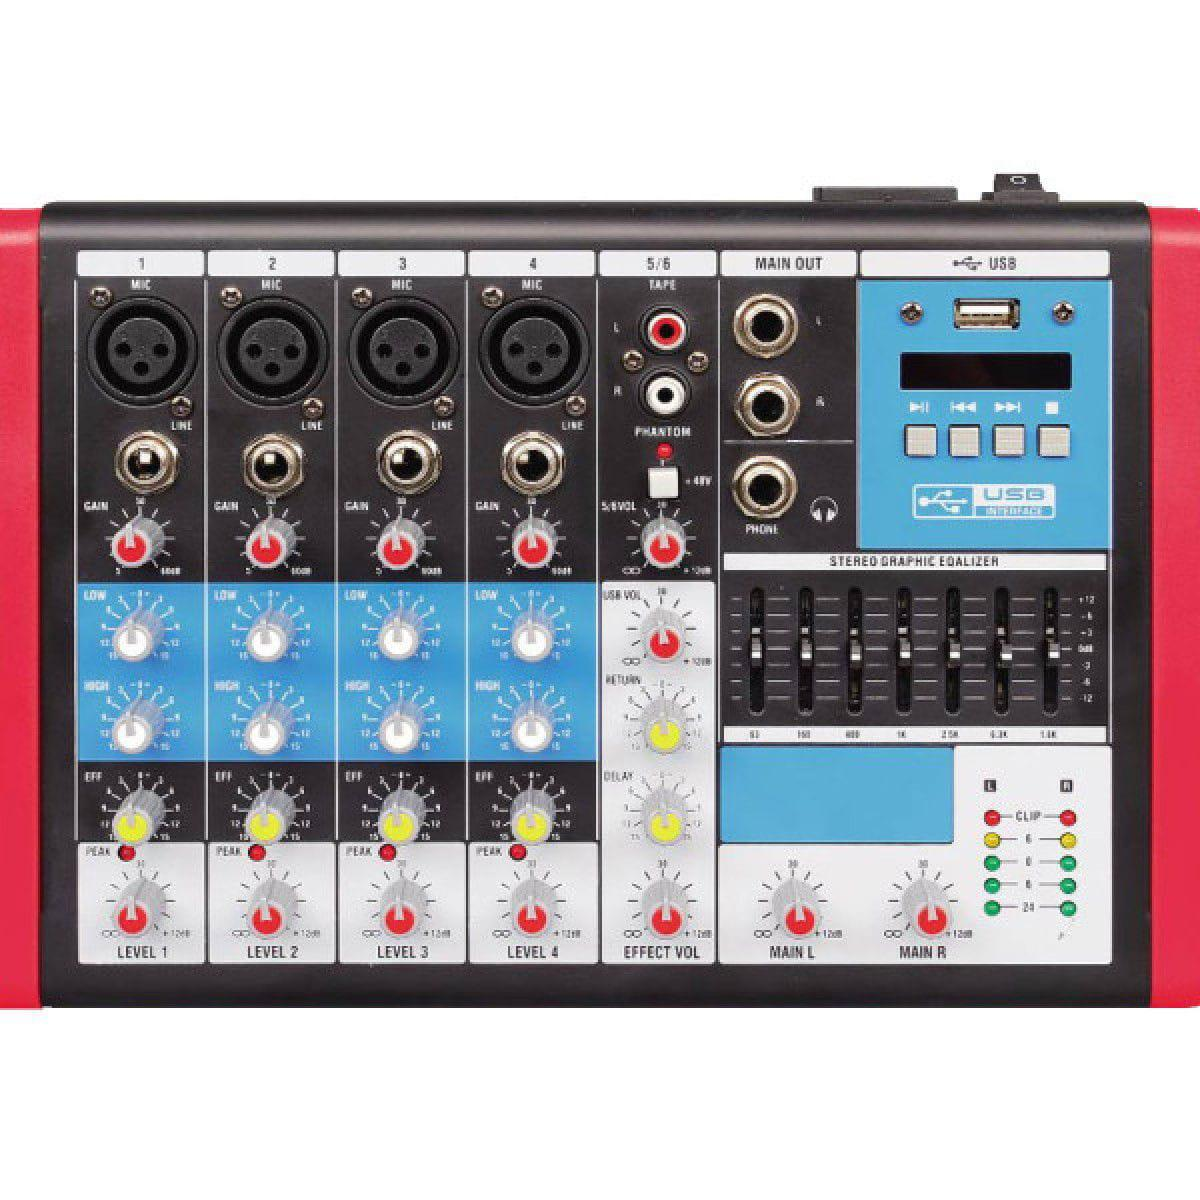 Mixer Compacta Soundvoice MC6EUX (6 Canais/Efeito/Equalizador/USB)